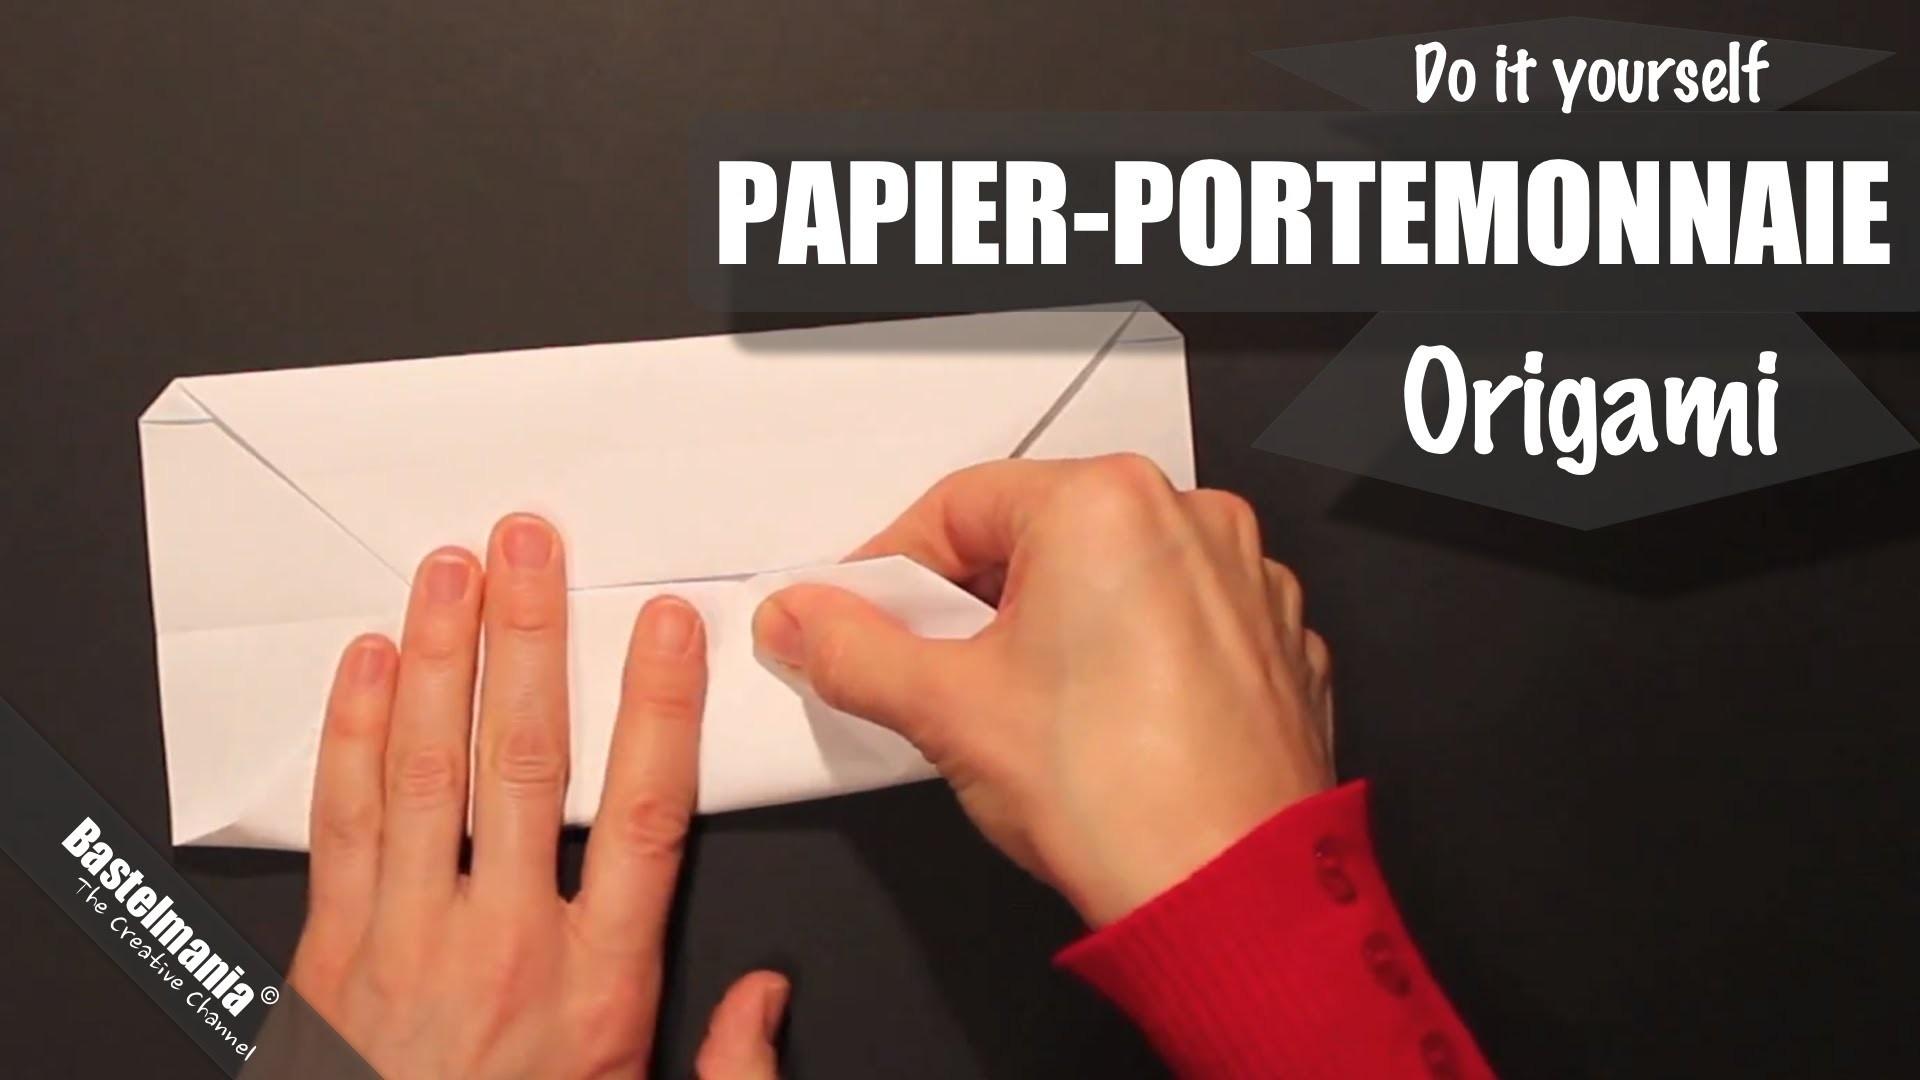 Papier Portemonnaie. Paper Wallet. Origami. Portemonnaie falten